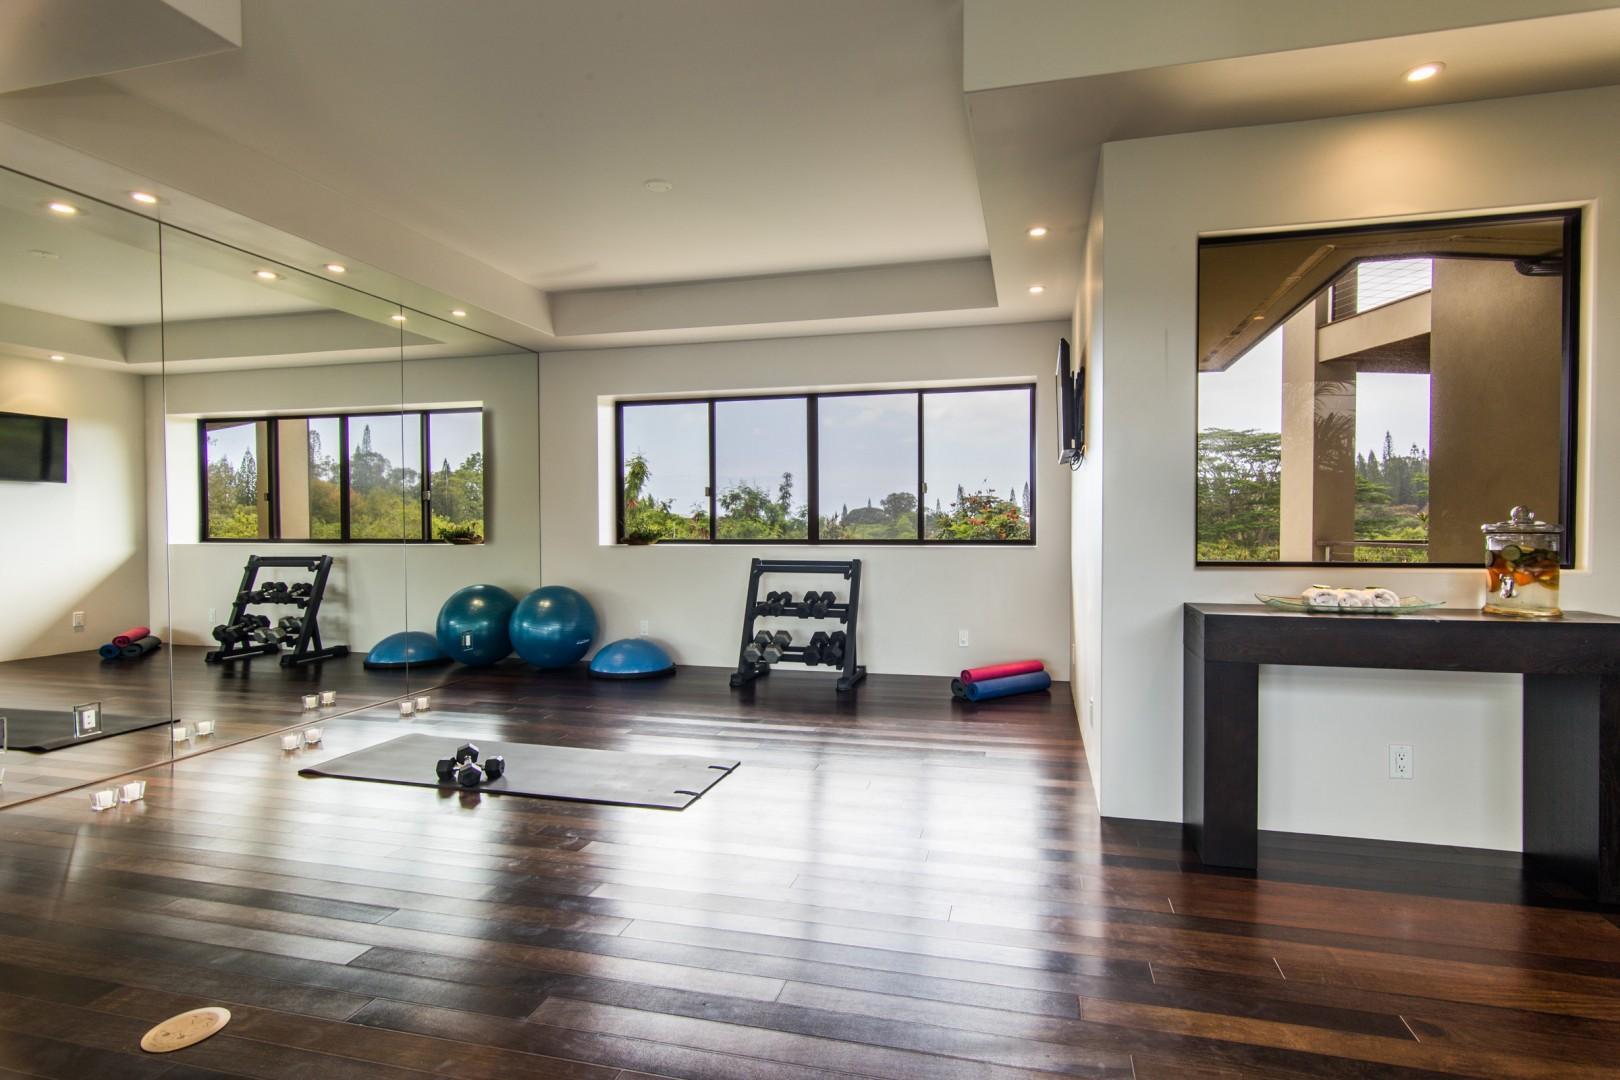 Yoga/exercise room.